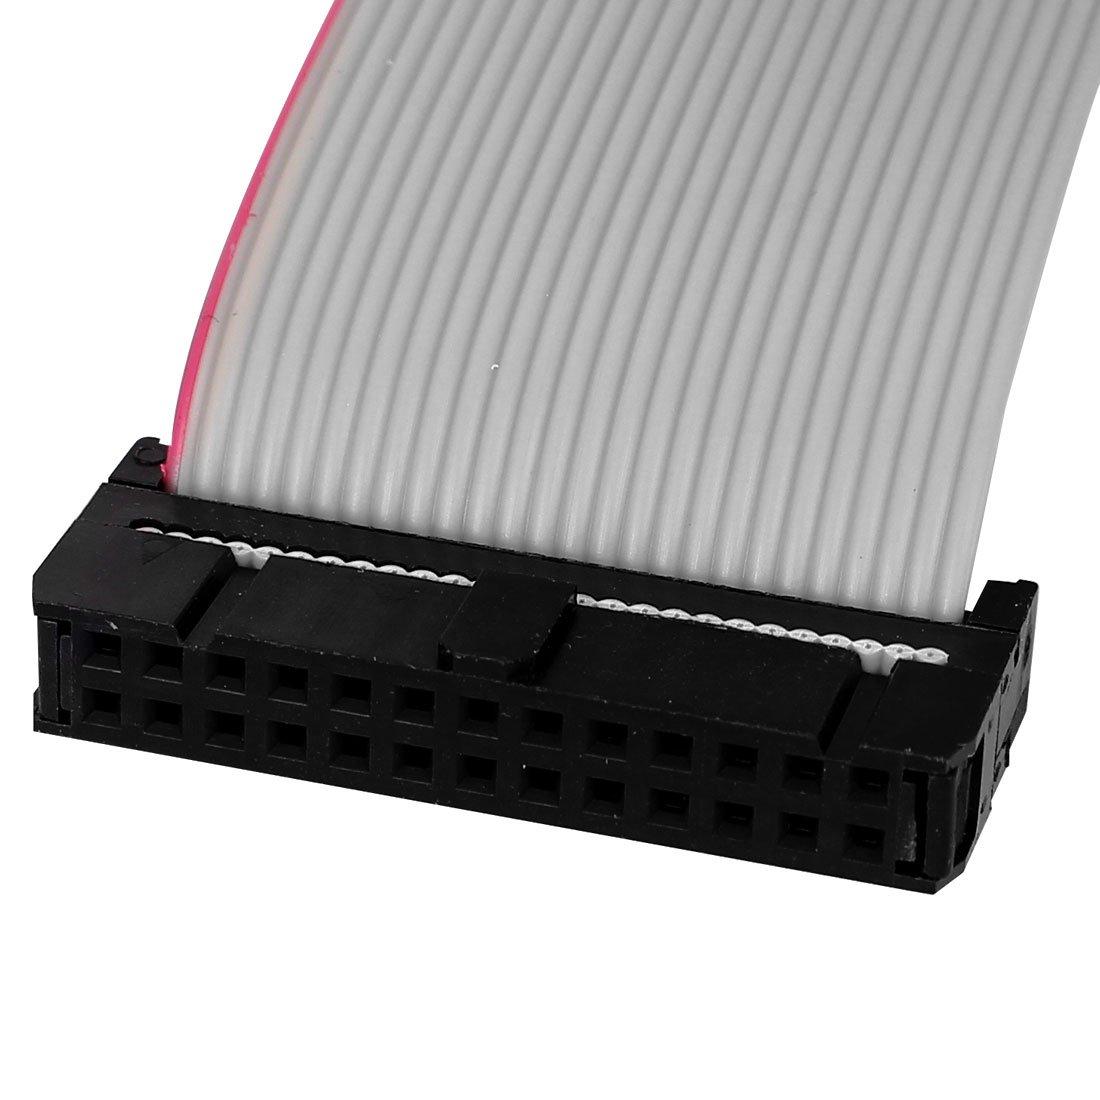 2Stk 2,54mm 26-Pin Buchse auf Buchse IDE PATA Flachbandkabel Verl/ängerung 50cm DE de